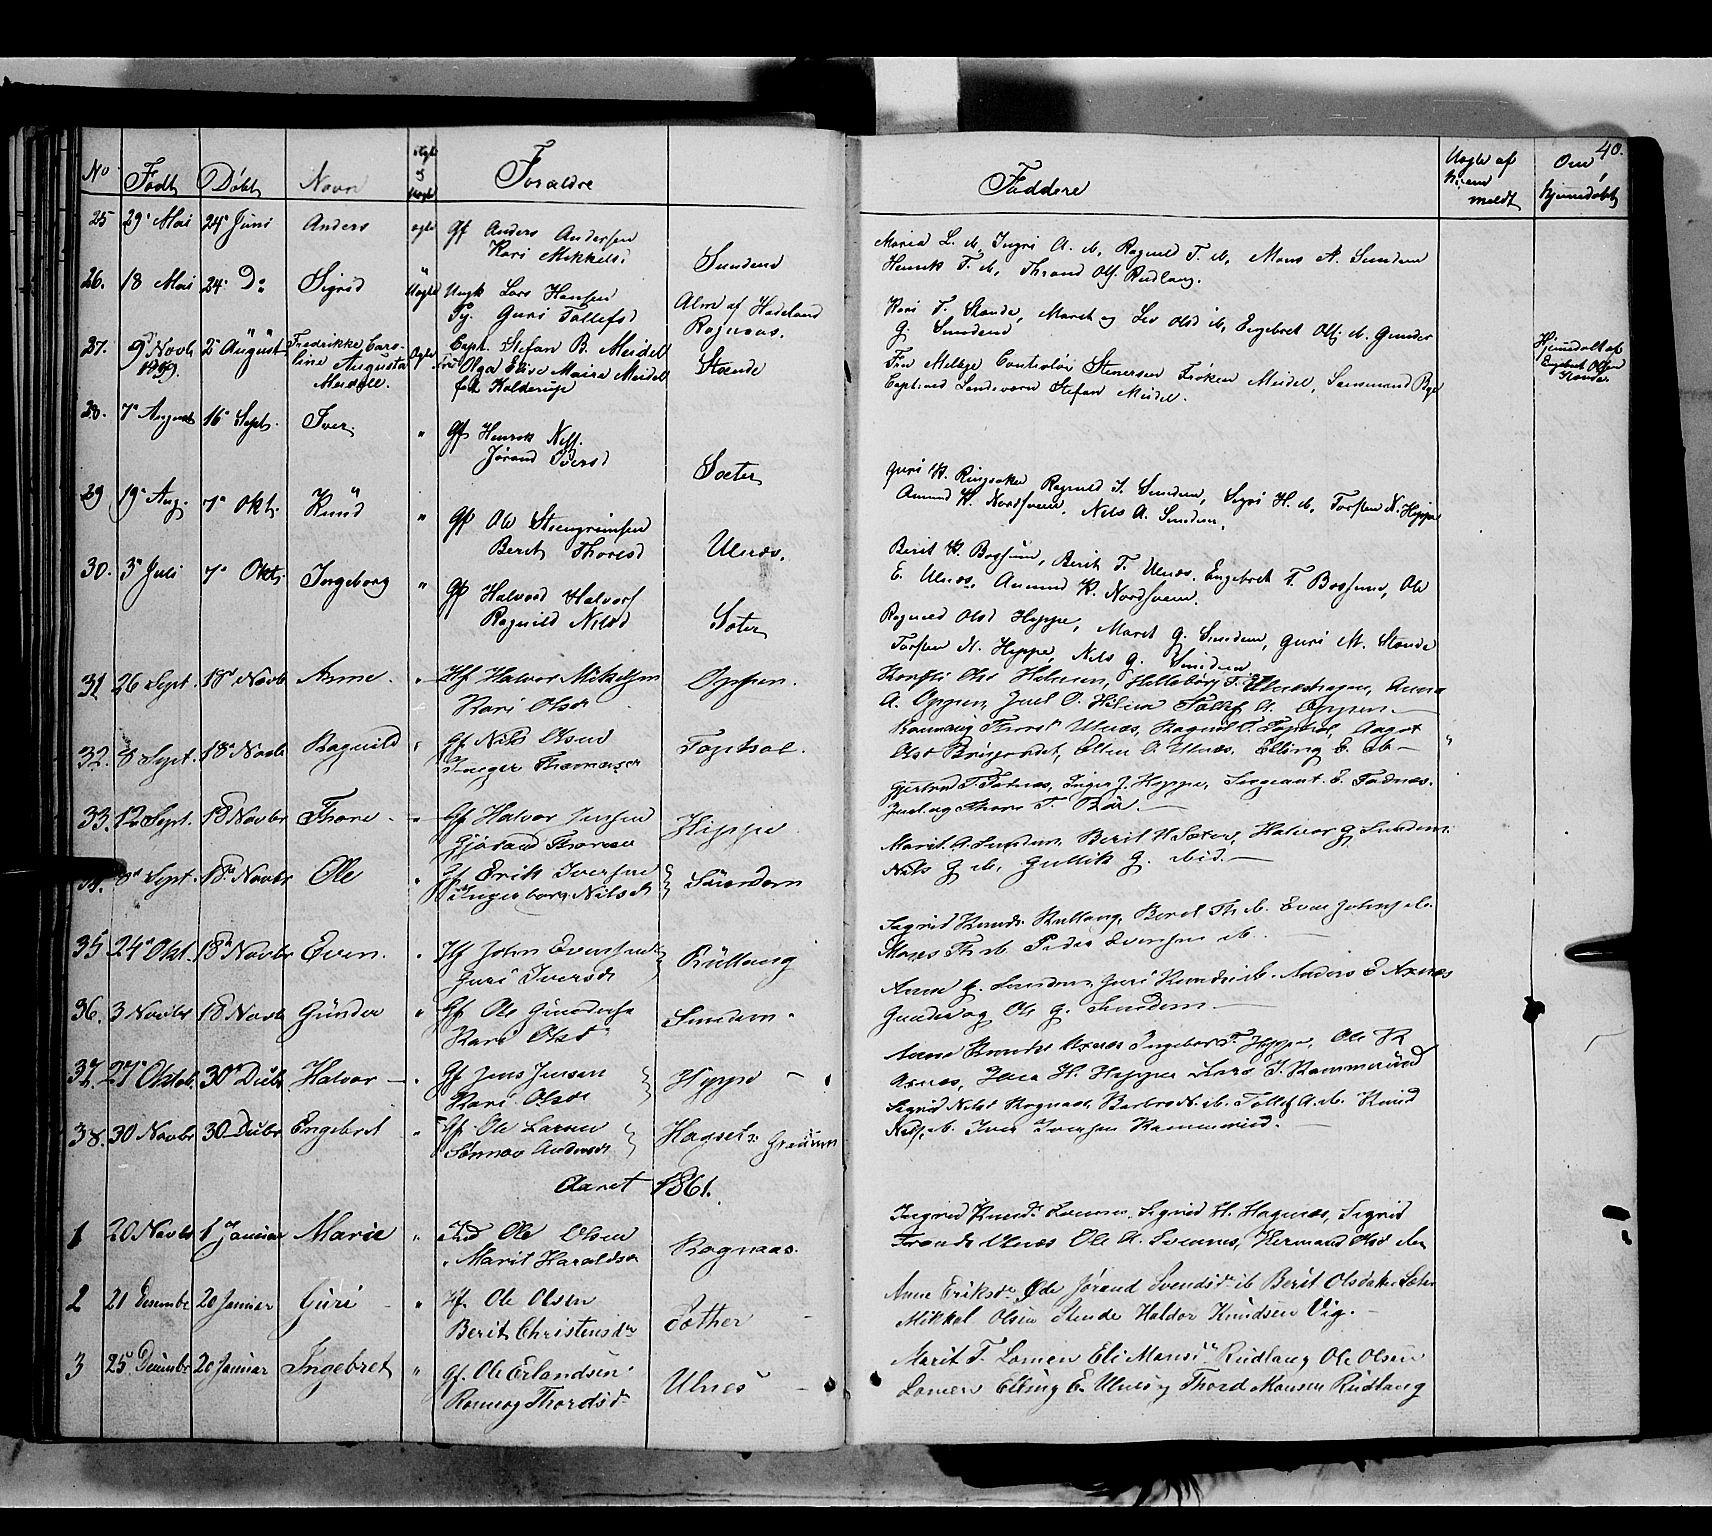 SAH, Nord-Aurdal prestekontor, Ministerialbok nr. 6, 1842-1863, s. 40